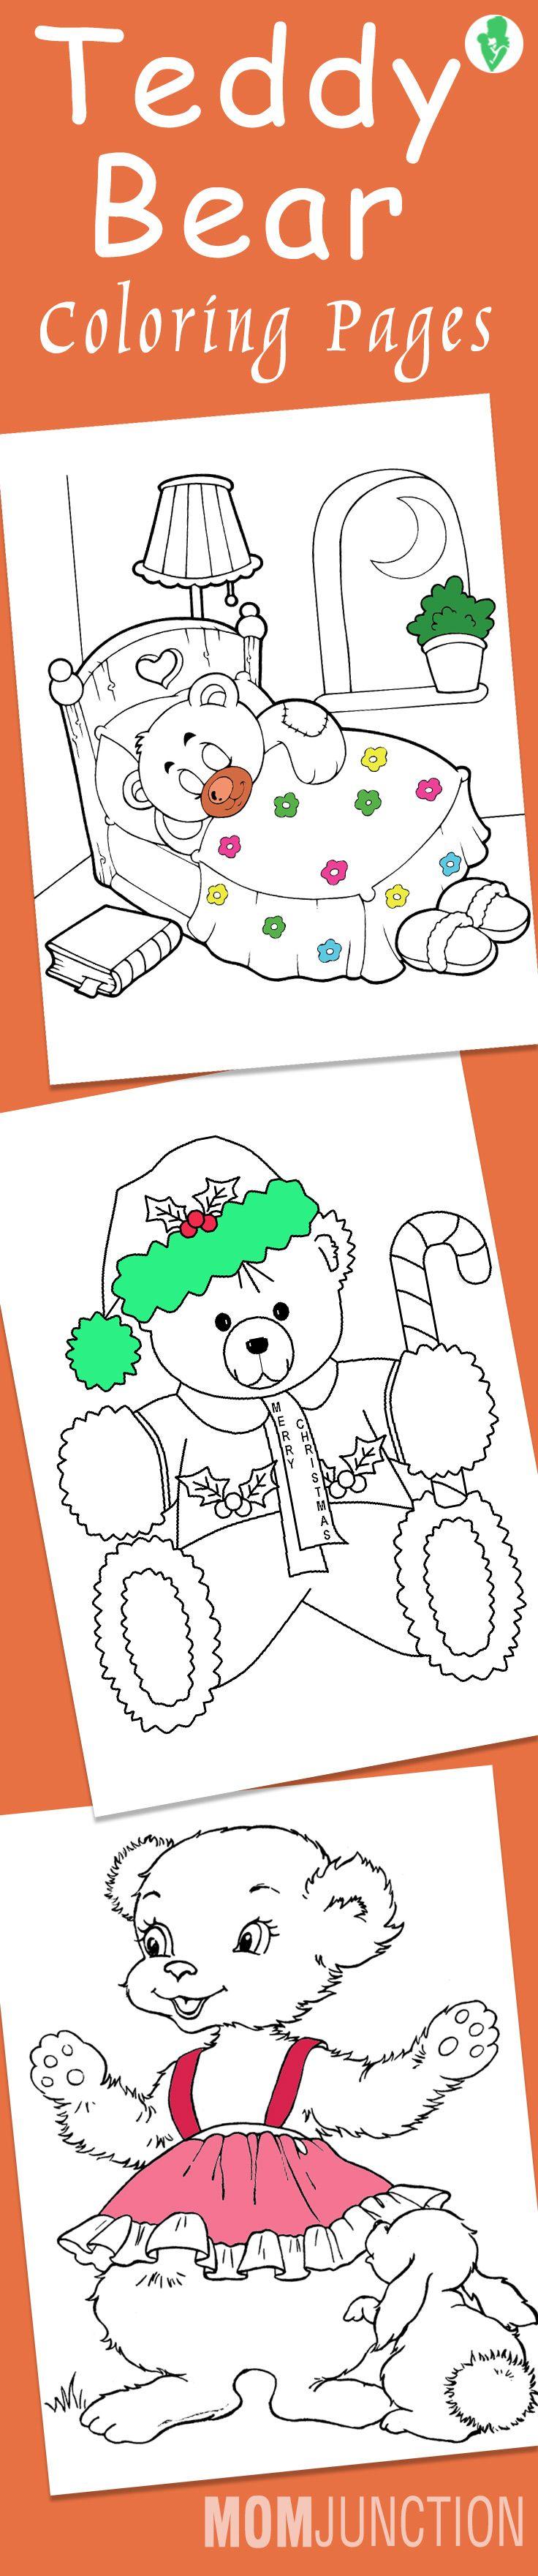 95 best teddy bears images on pinterest drawings teddy bears